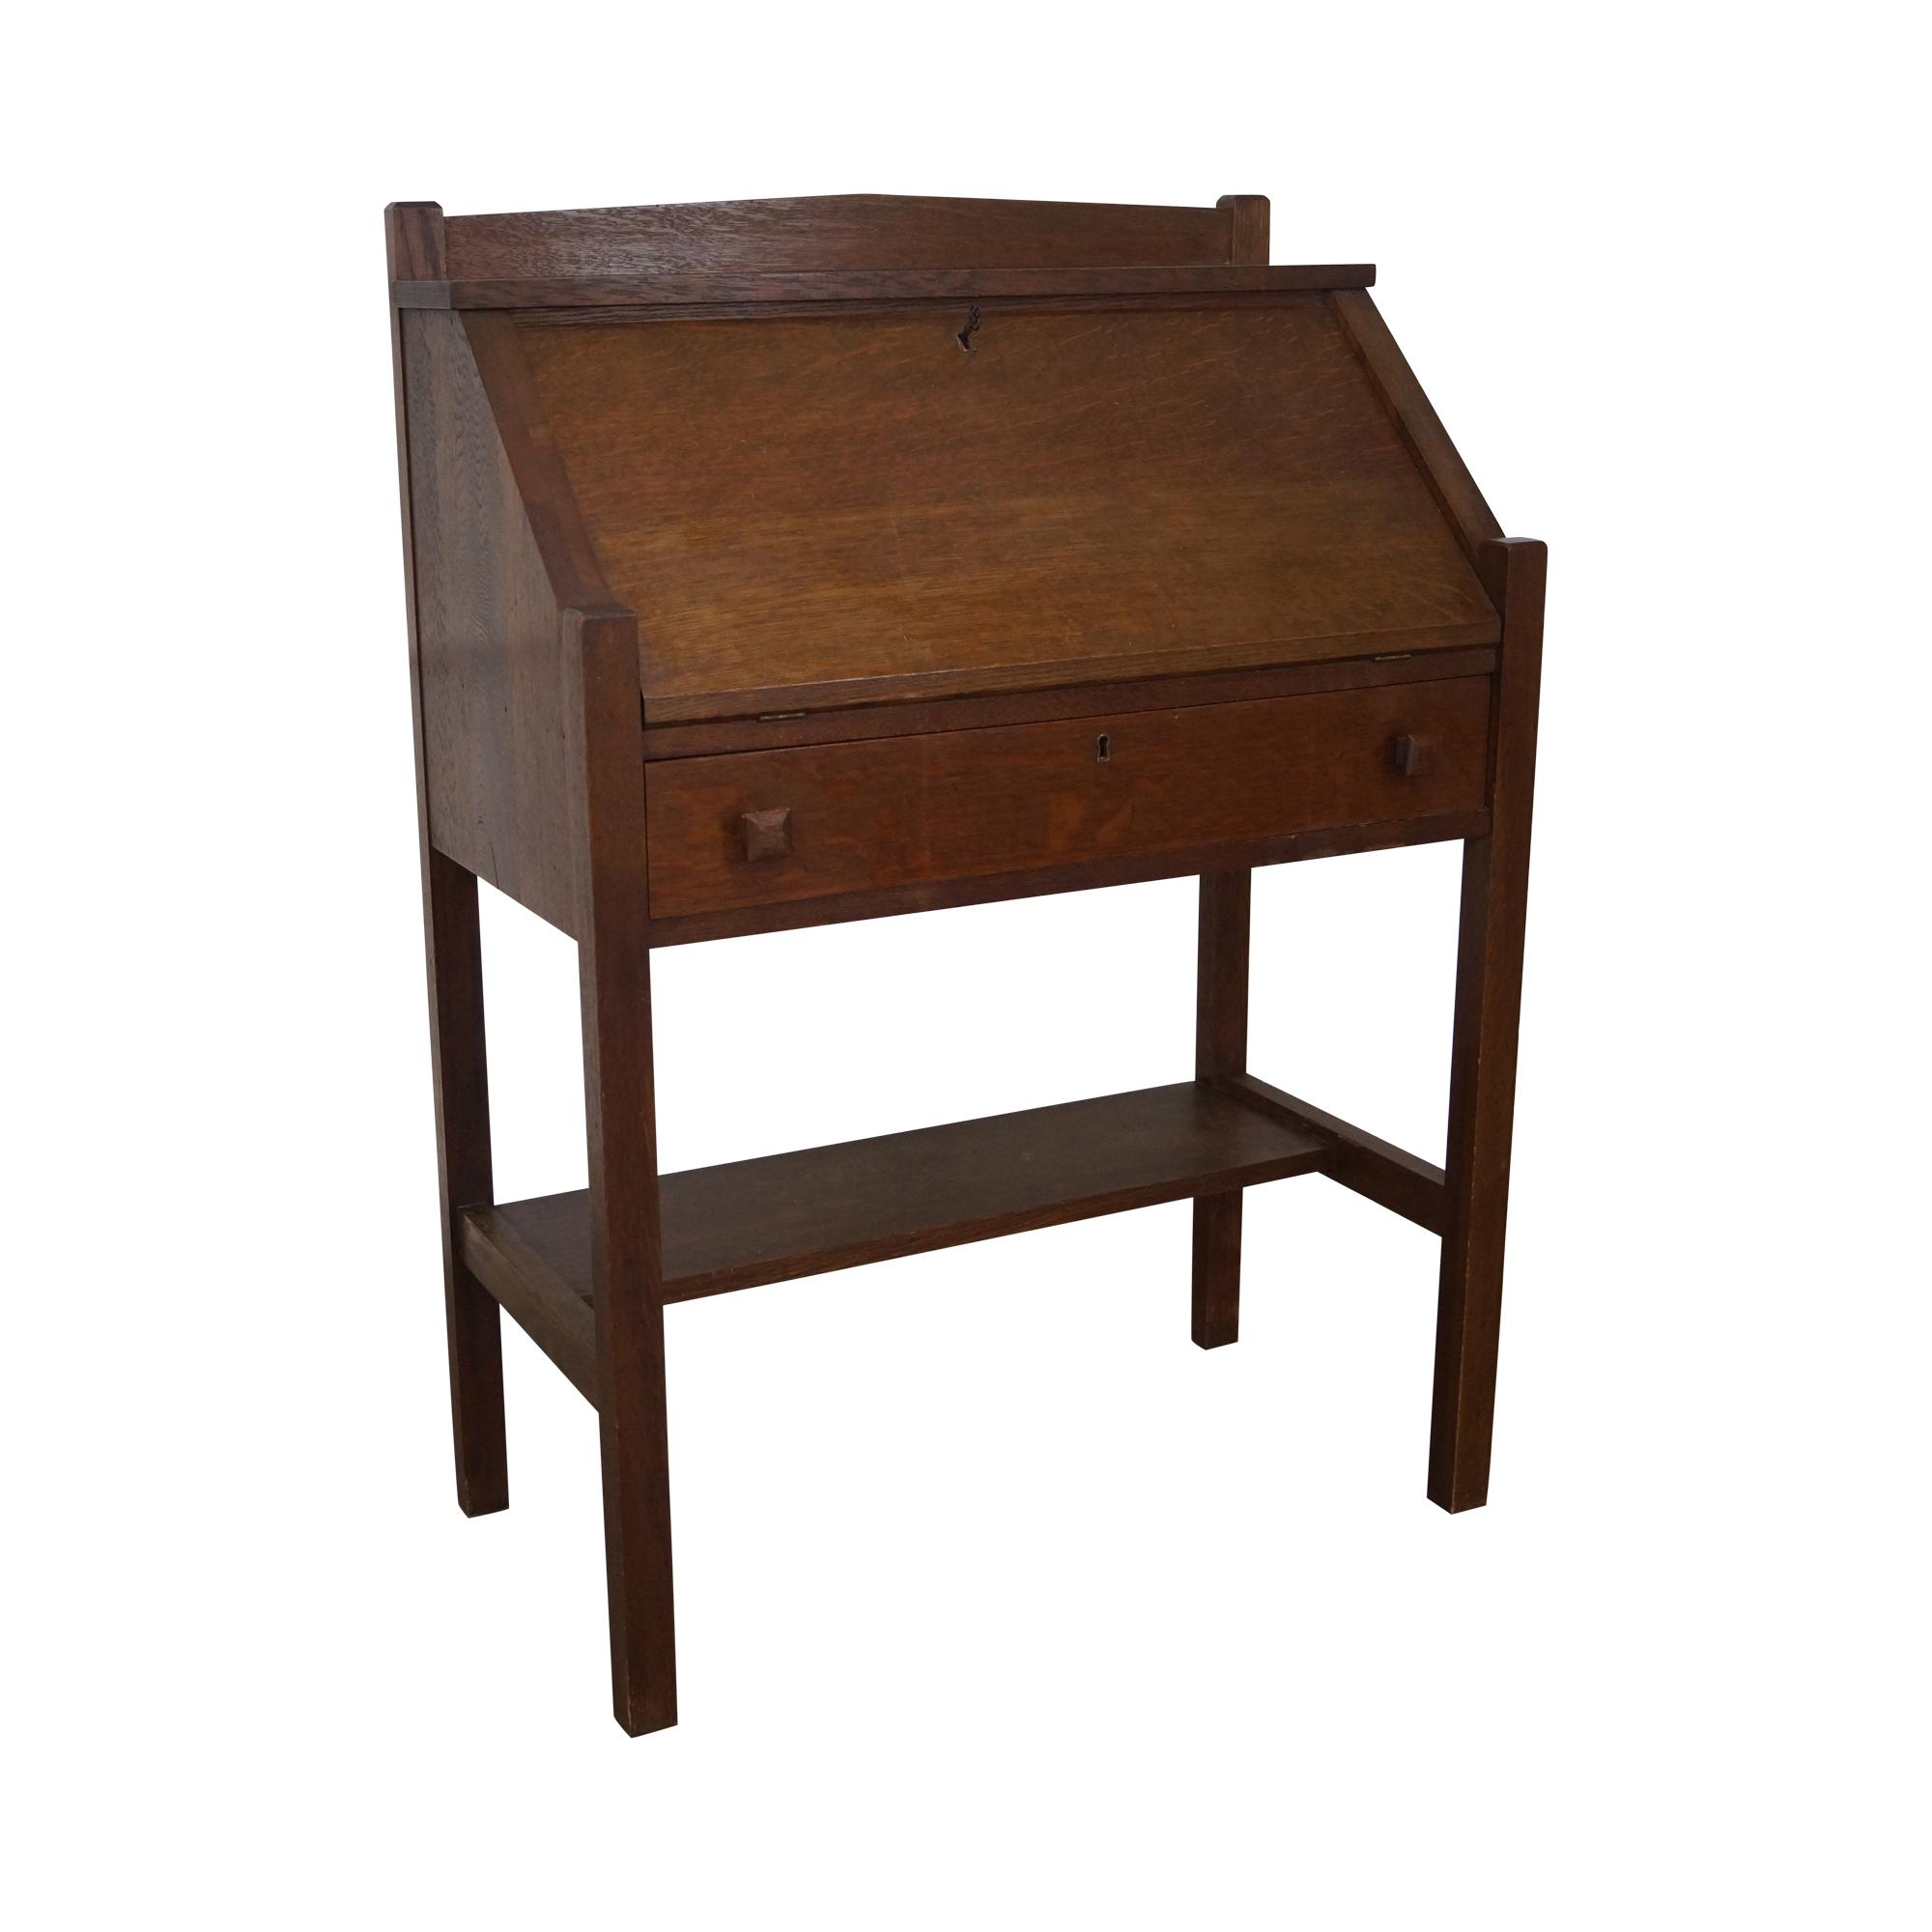 Antique Mission Oak Slant Front Writing Desk By Cron Kills Age Country Of Writing Desk Mission Oak Desk